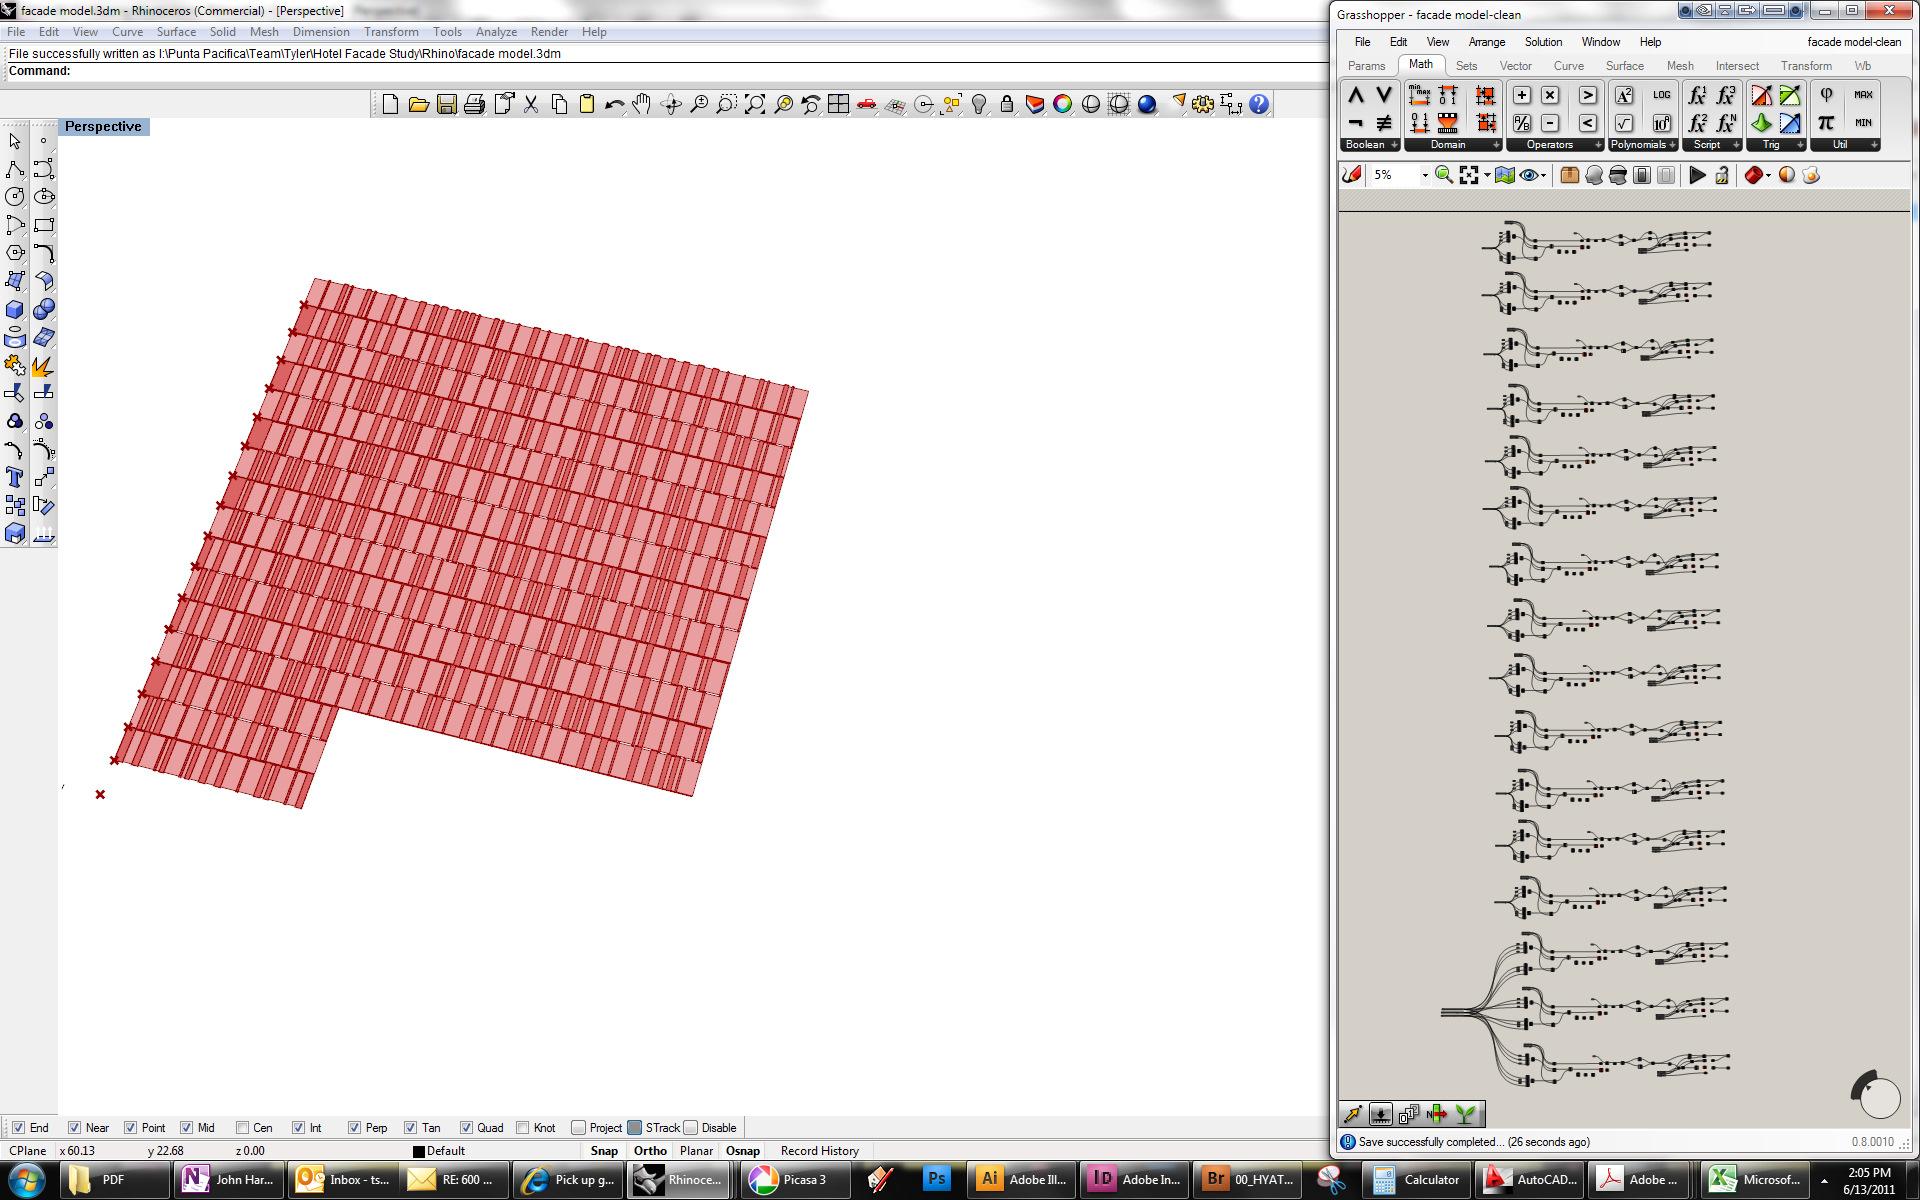 Fullscreen capture 6132011 20506 PM.jpg